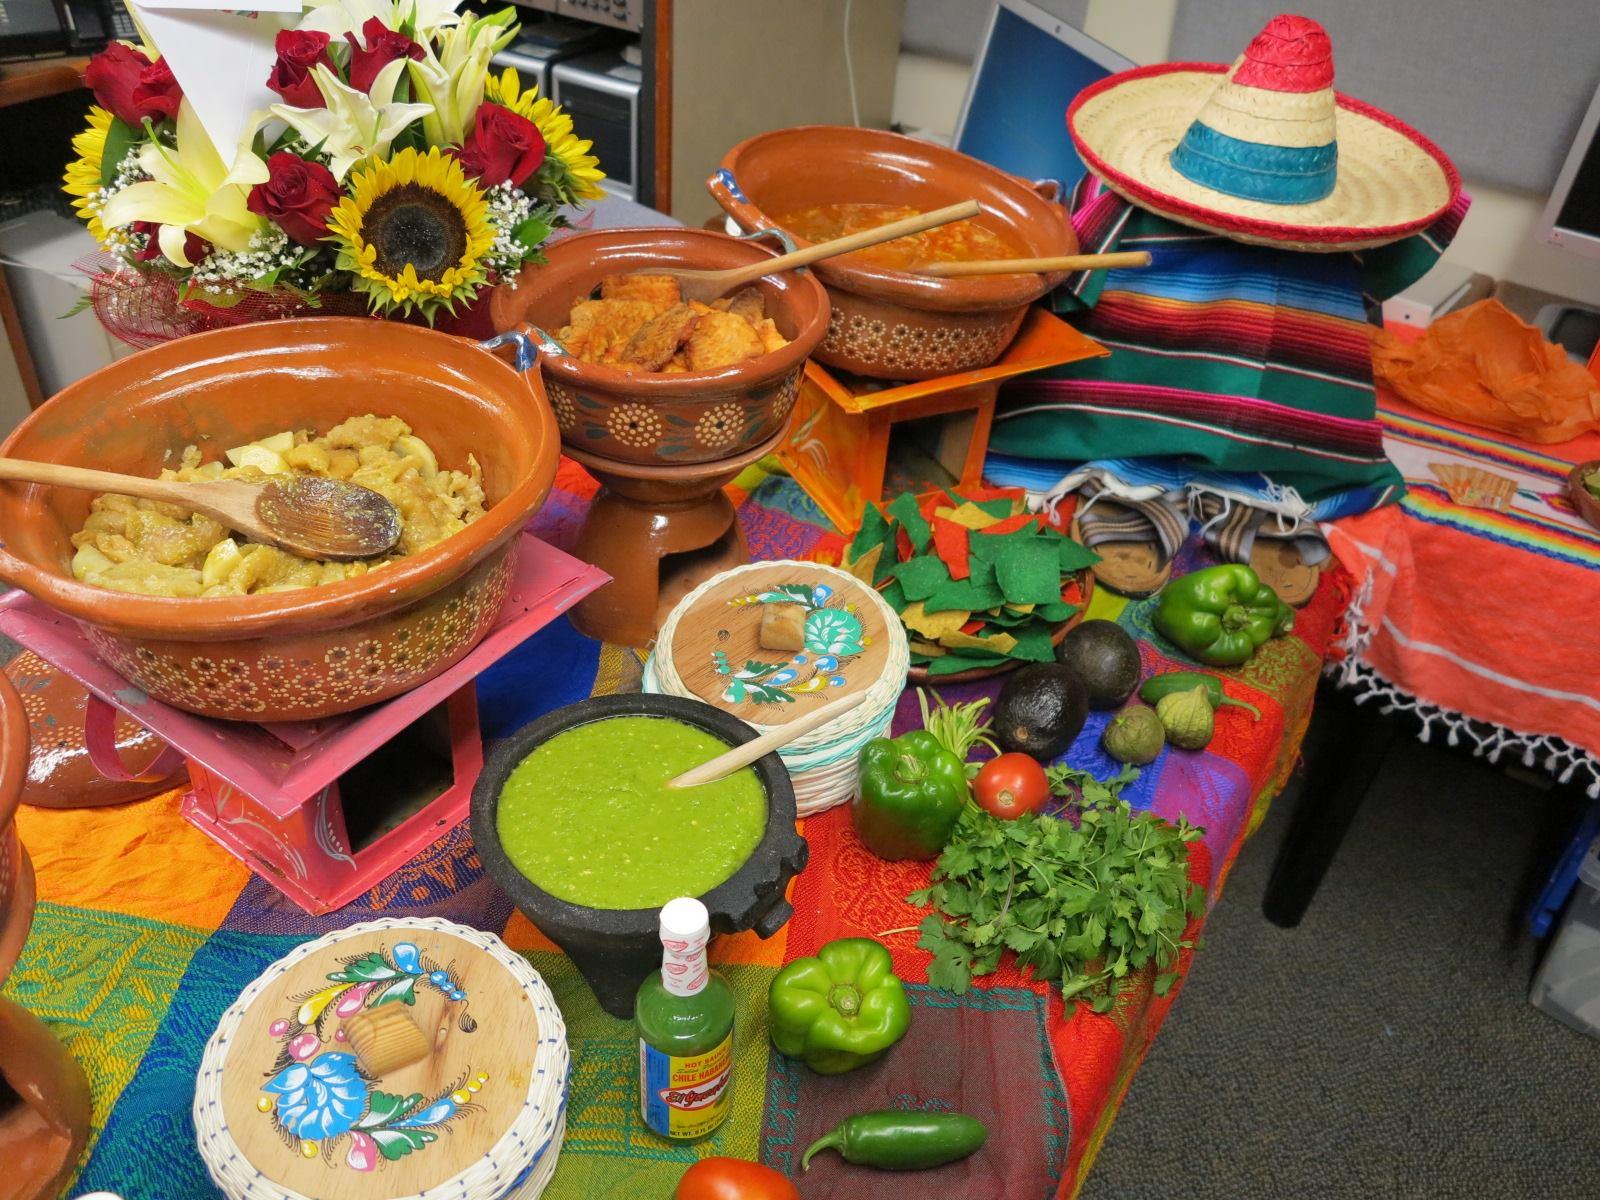 Riqueza cultural y nutricional de la comida mexicana  La